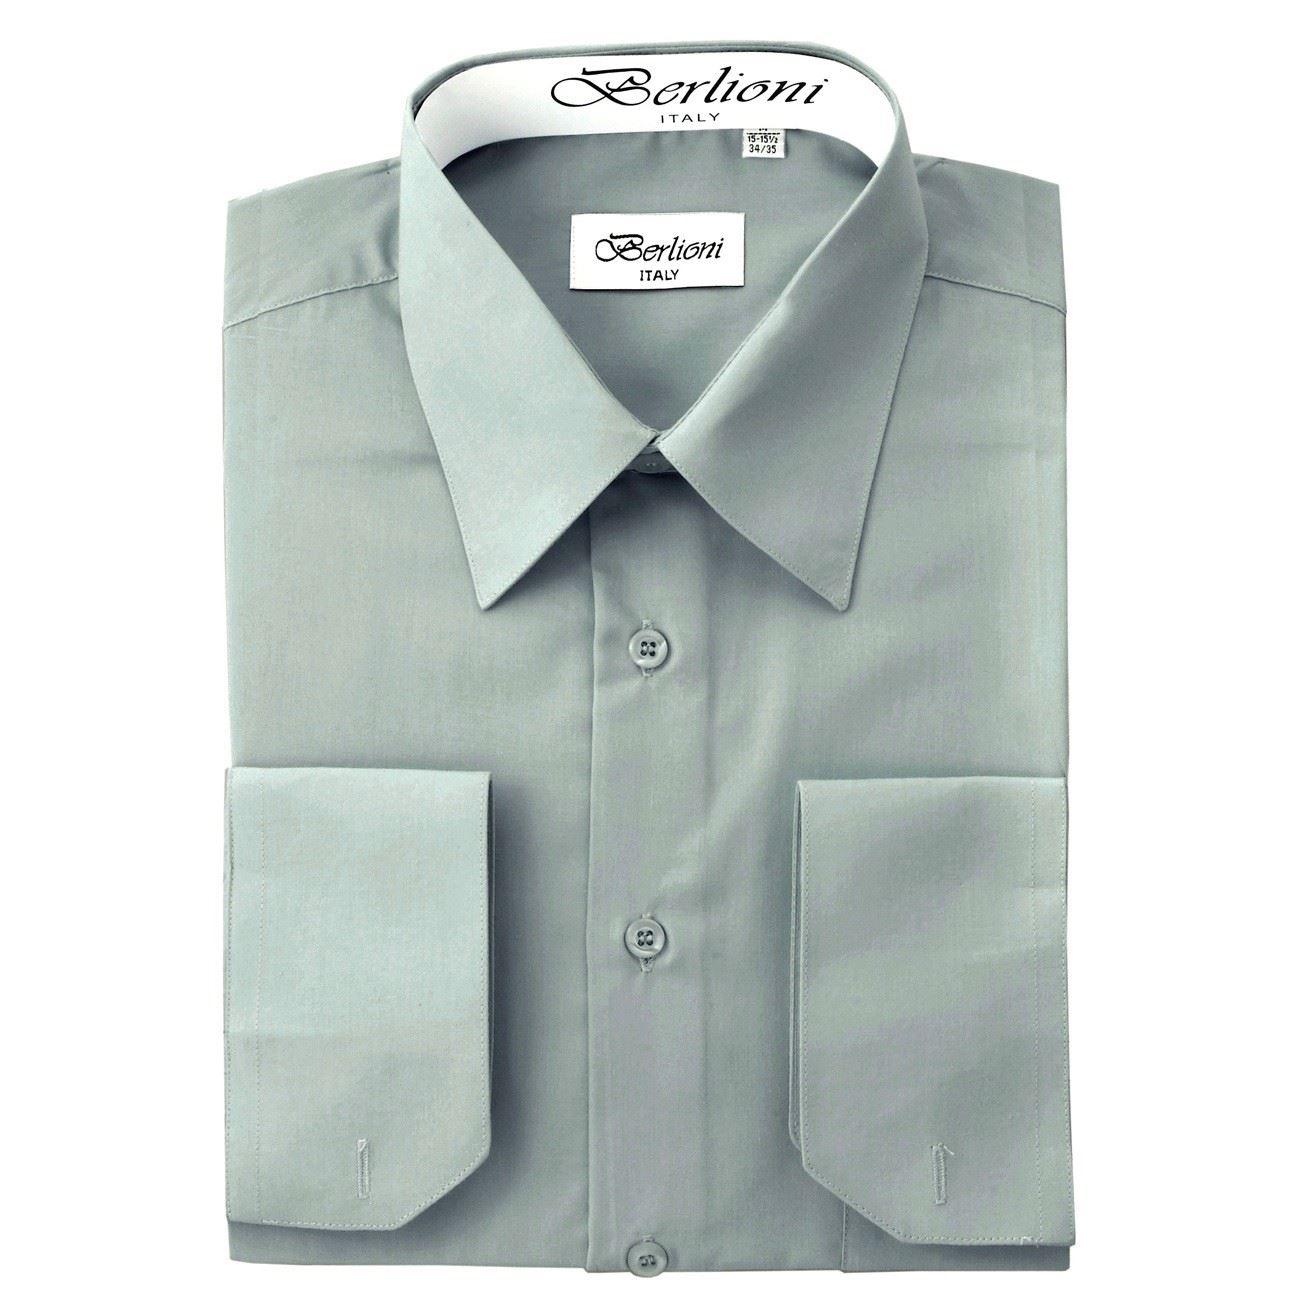 Berlioni italy men 39 s dress shirt convertible french cuffs for French collar dress shirt